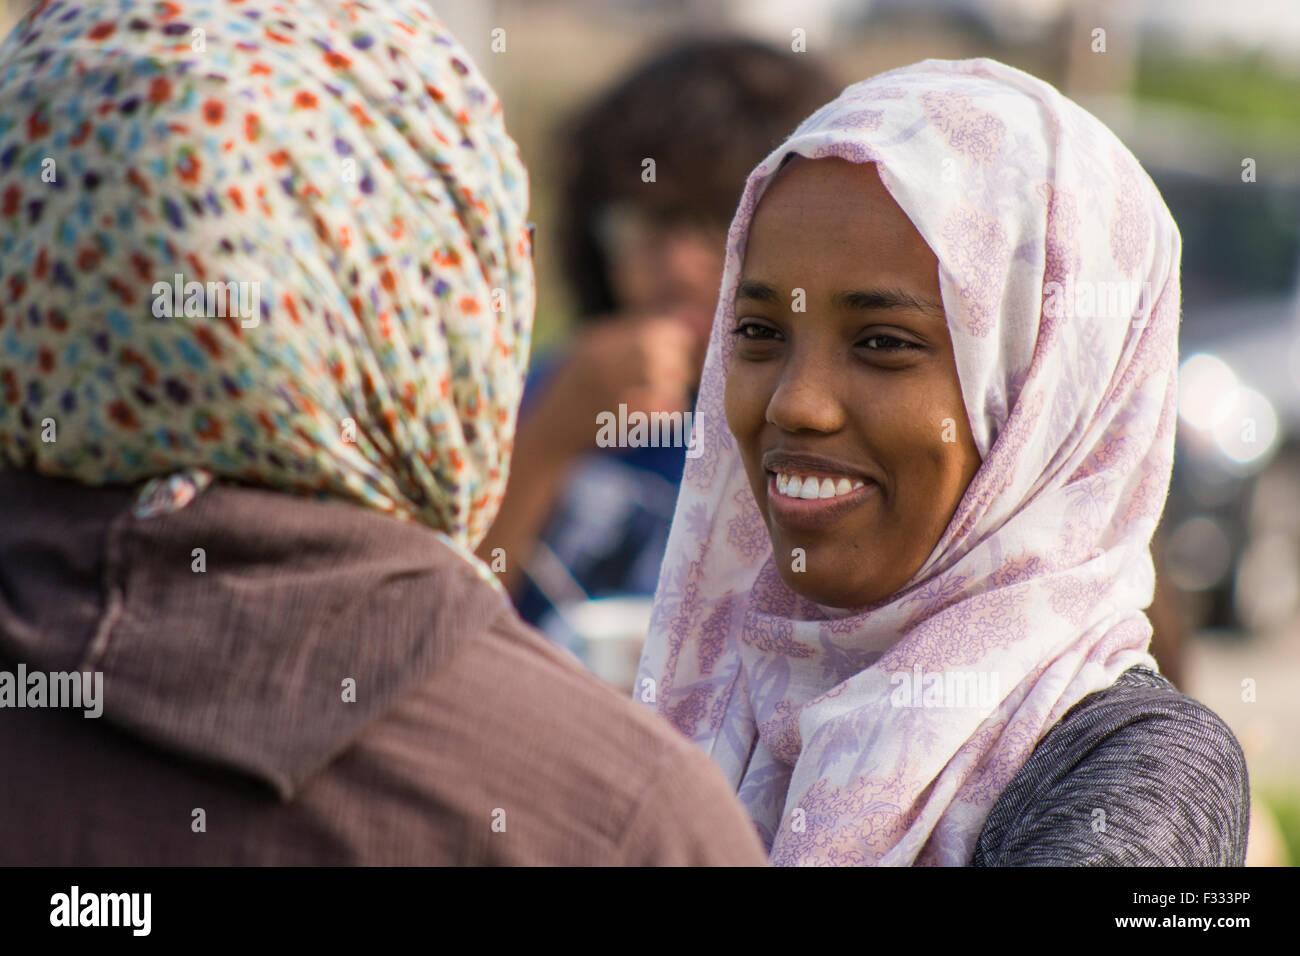 Two Muslim women wearing a Hijab. - Stock Image